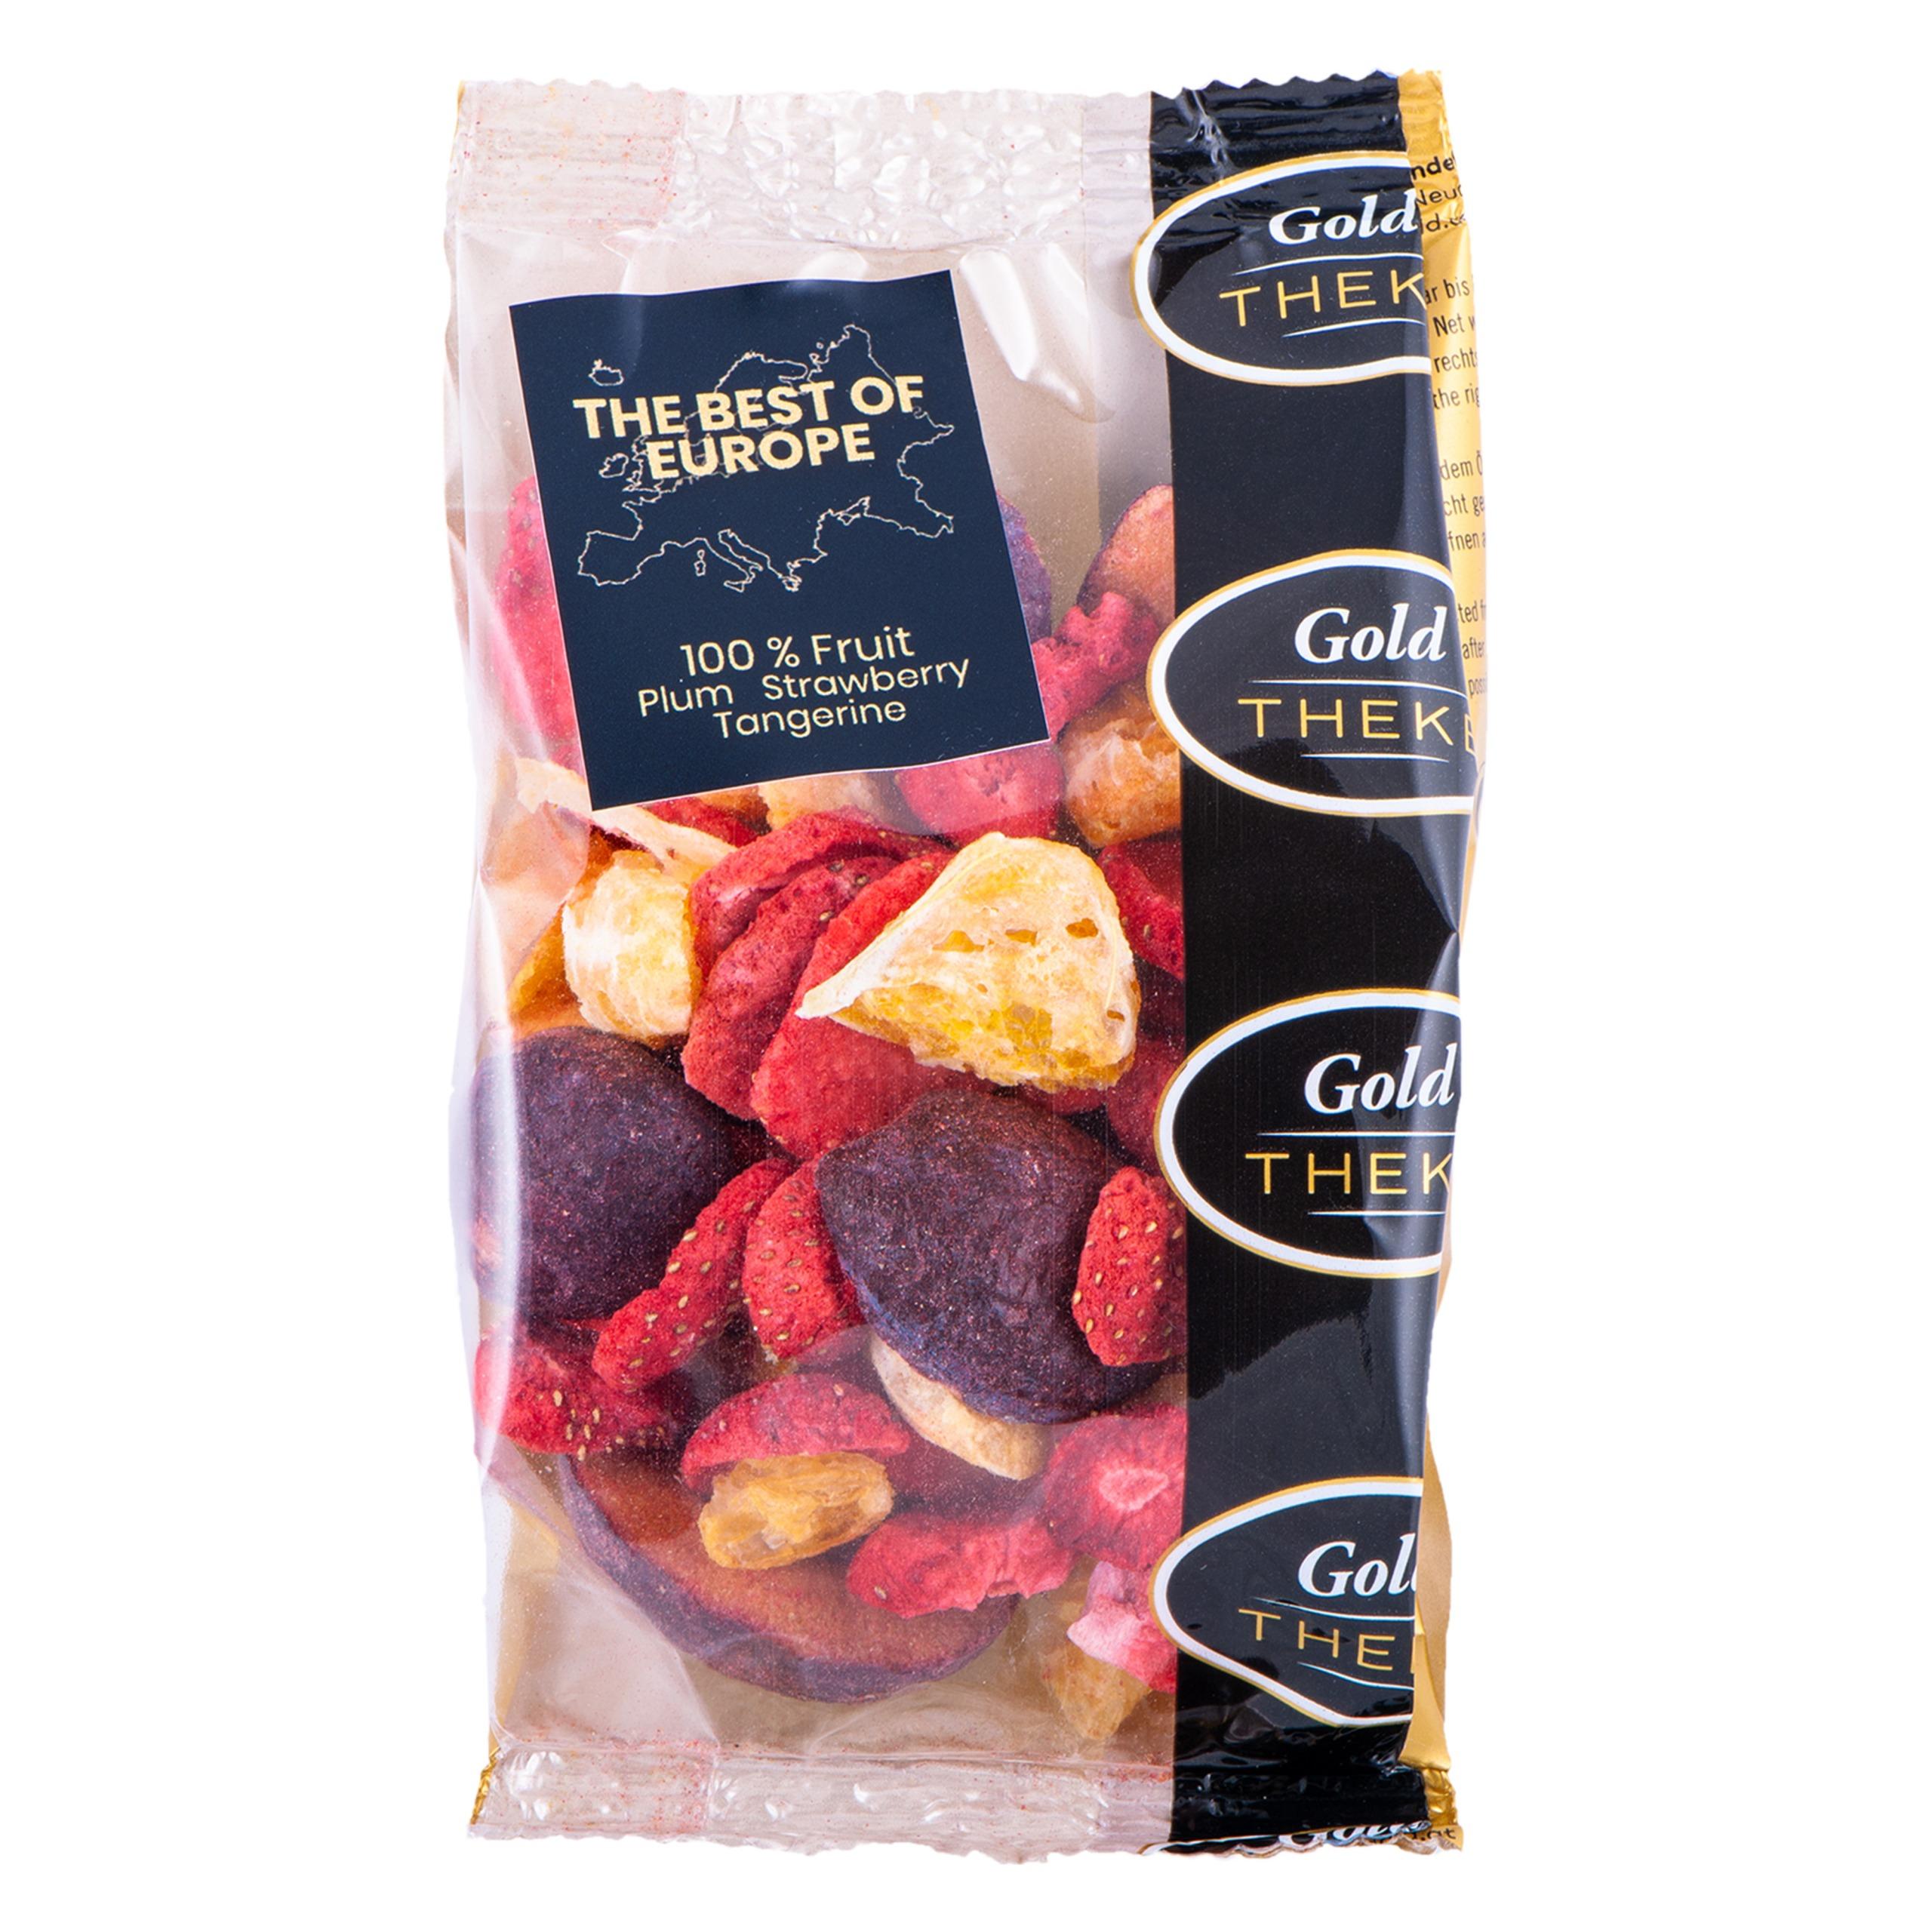 gefriegetrocknete Fruchtmischung GoldTHEKE - Best of Europe - gefriergetrocknete Erdbeeren, Mandarinen, Pflaumen